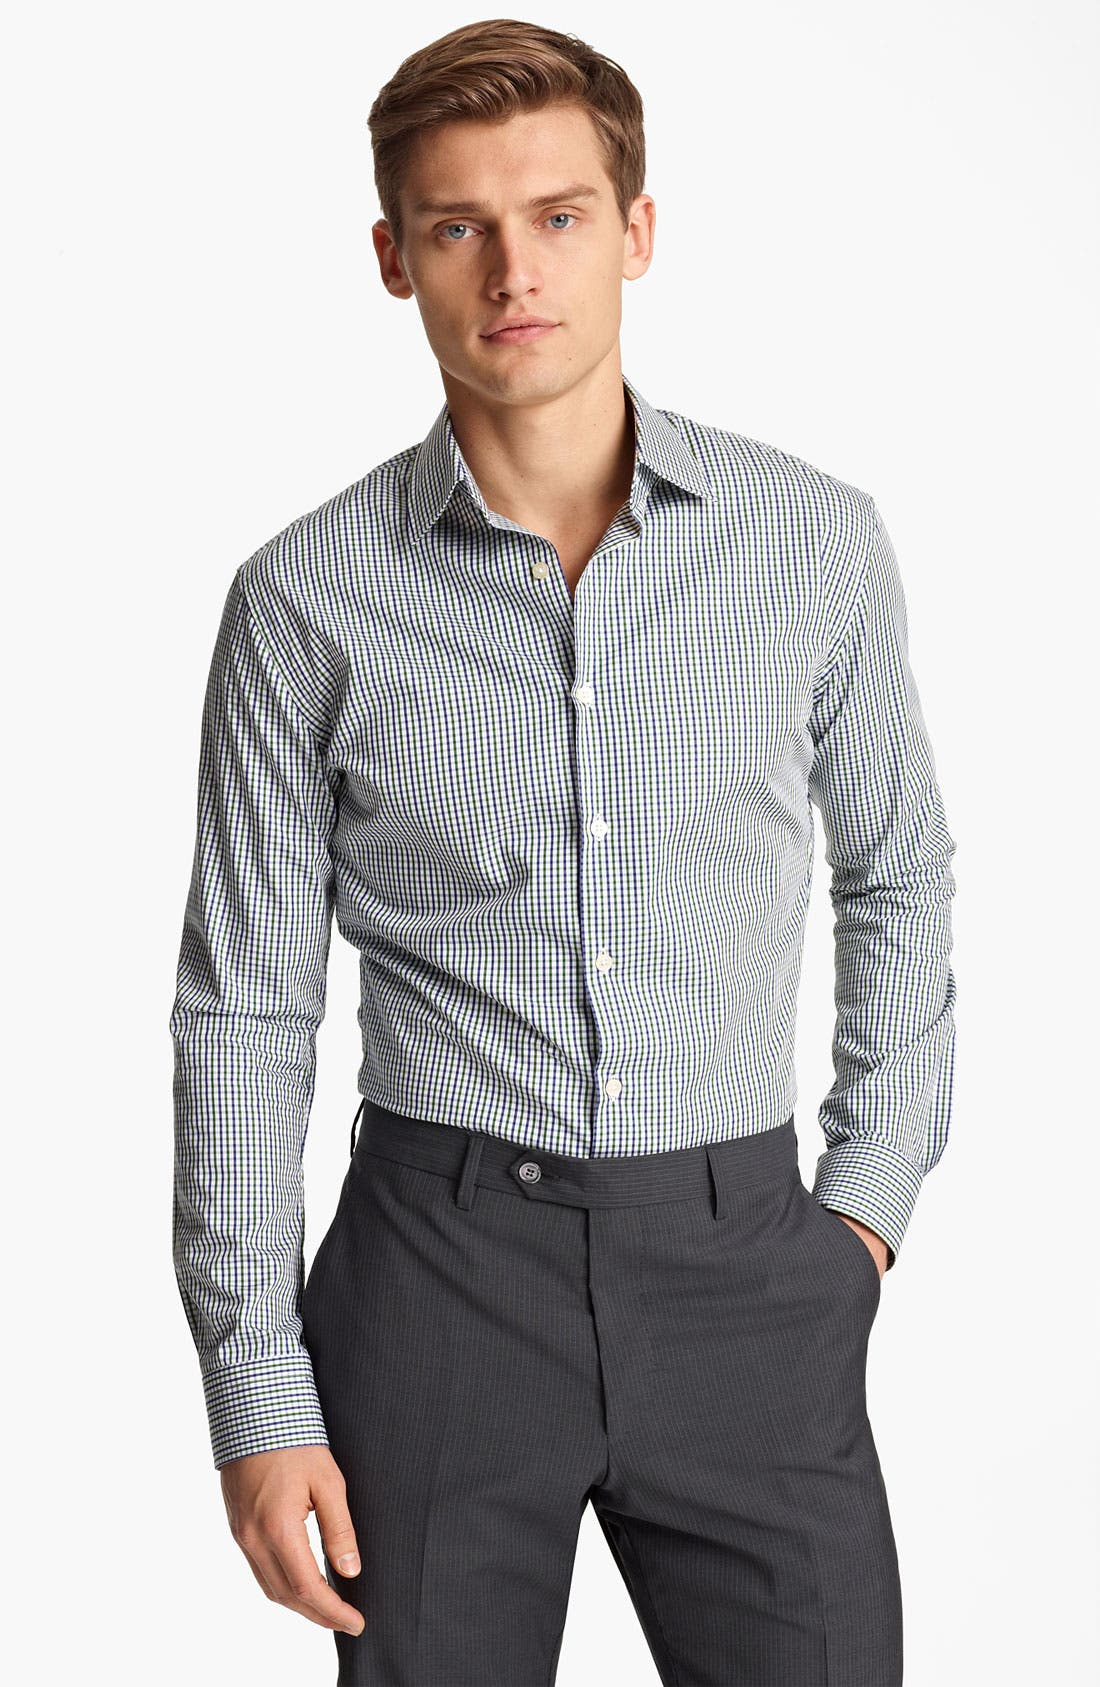 Main Image - Paul Smith London Gingham Check Shirt